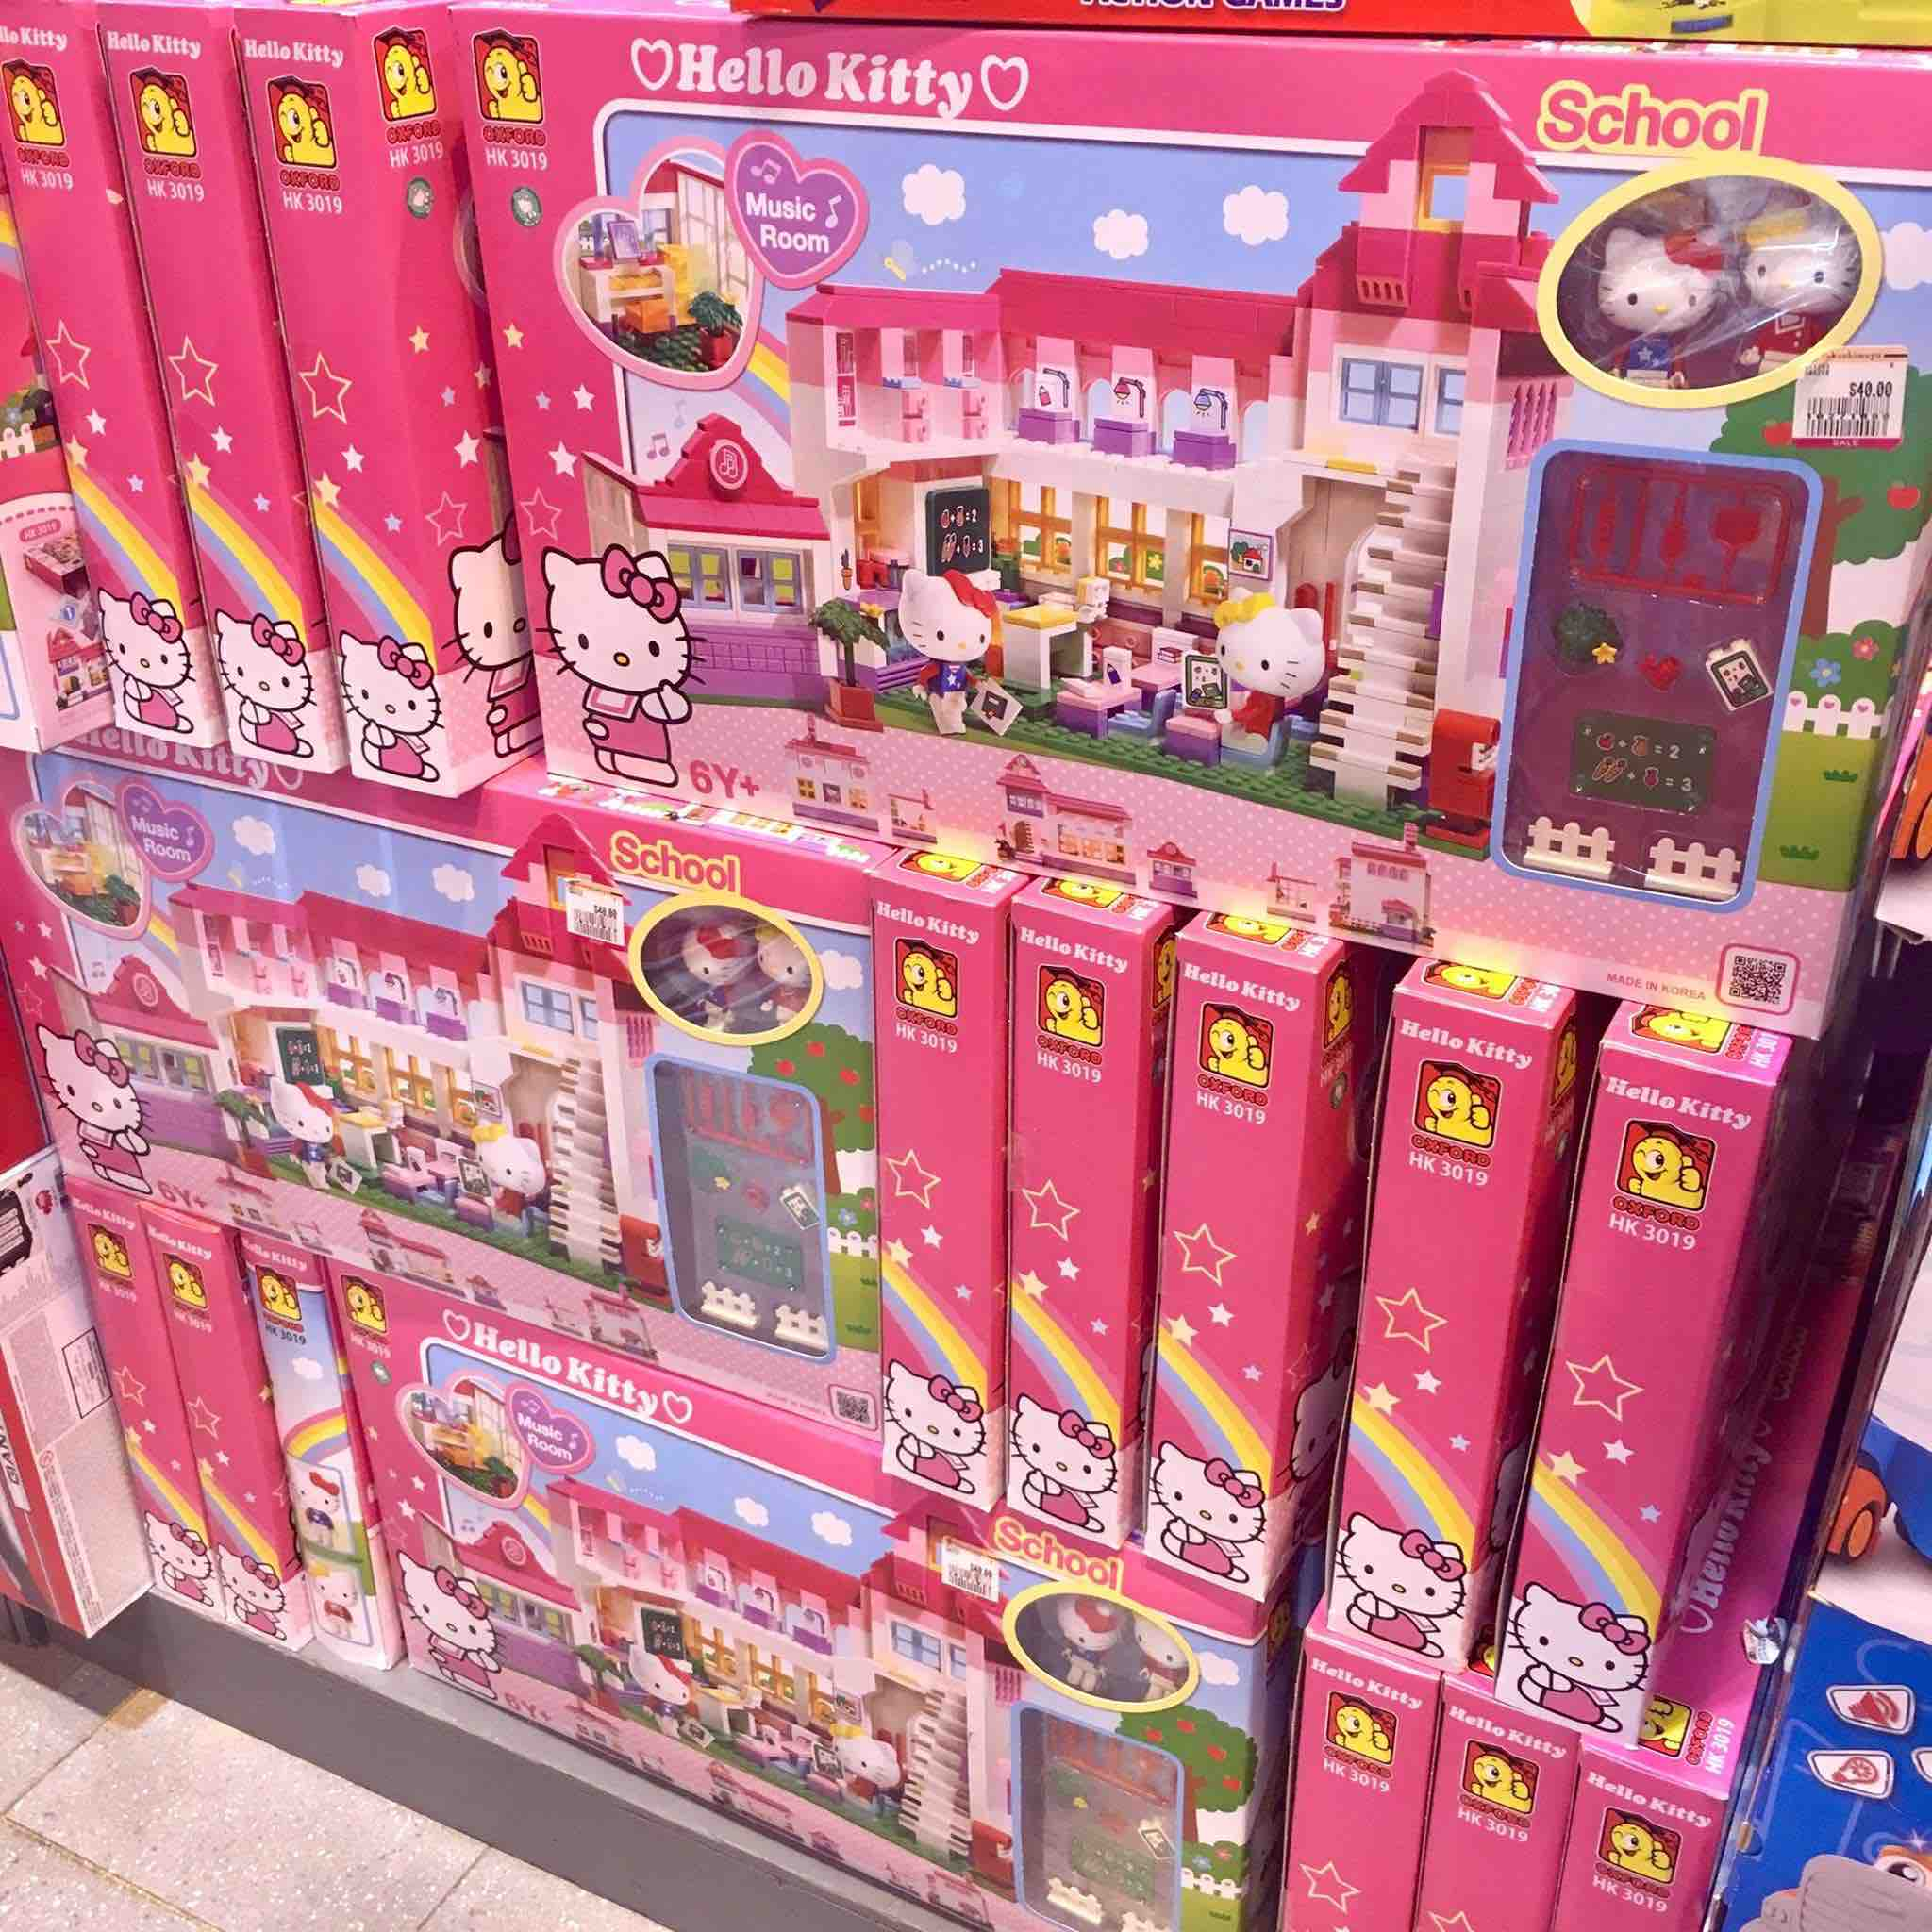 Takashimaya Singapore 21st Craziest Toys Sale Promotion 28 Jul - 6 Aug 2017   Why Not Deals 11 & Promotions